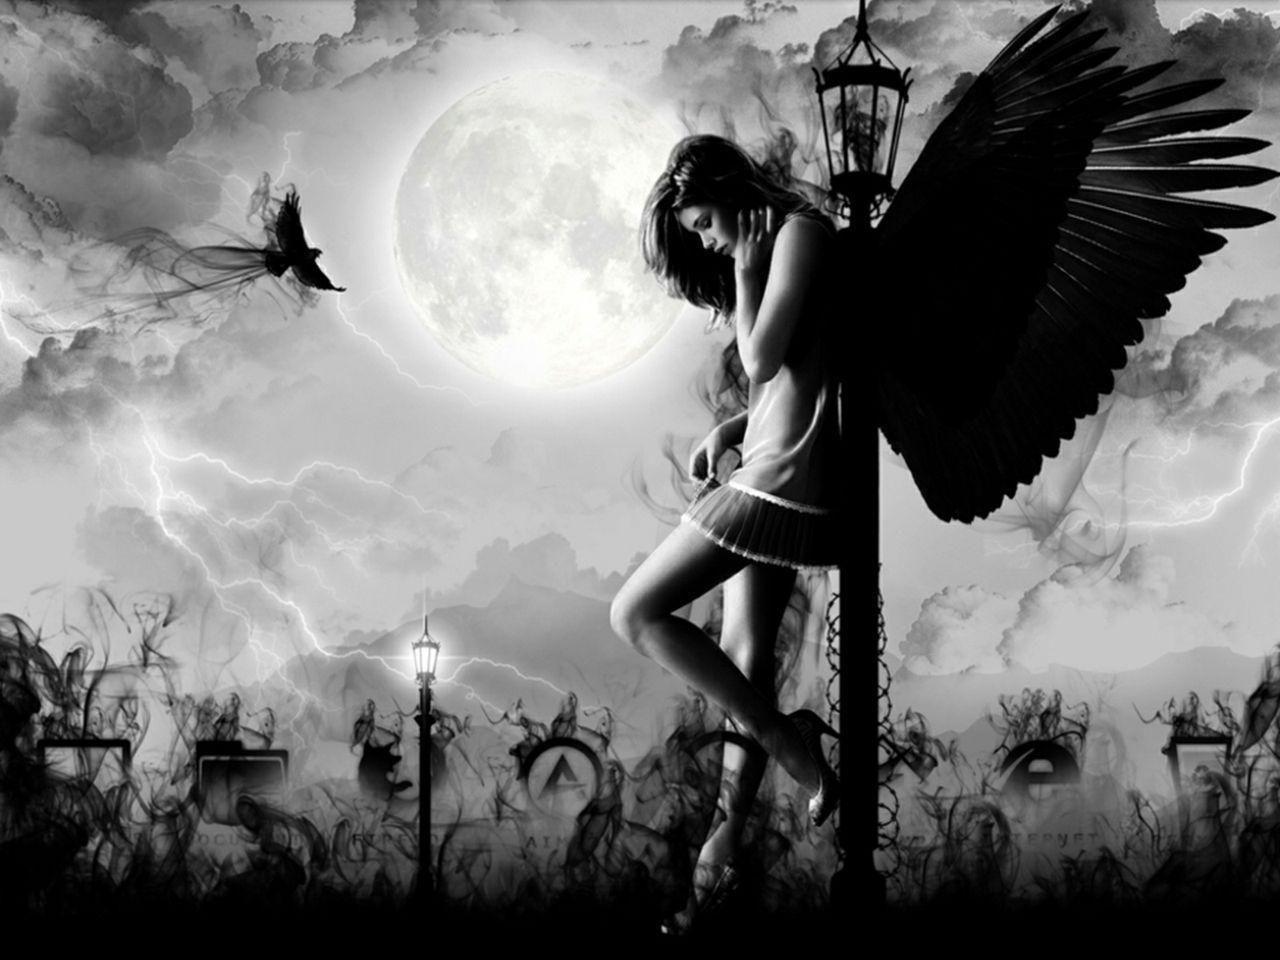 Dark Angel Wallpaper HD | Wallpaper | Pinterest | Dark angel wallpaper, Sad angel and Angel ...